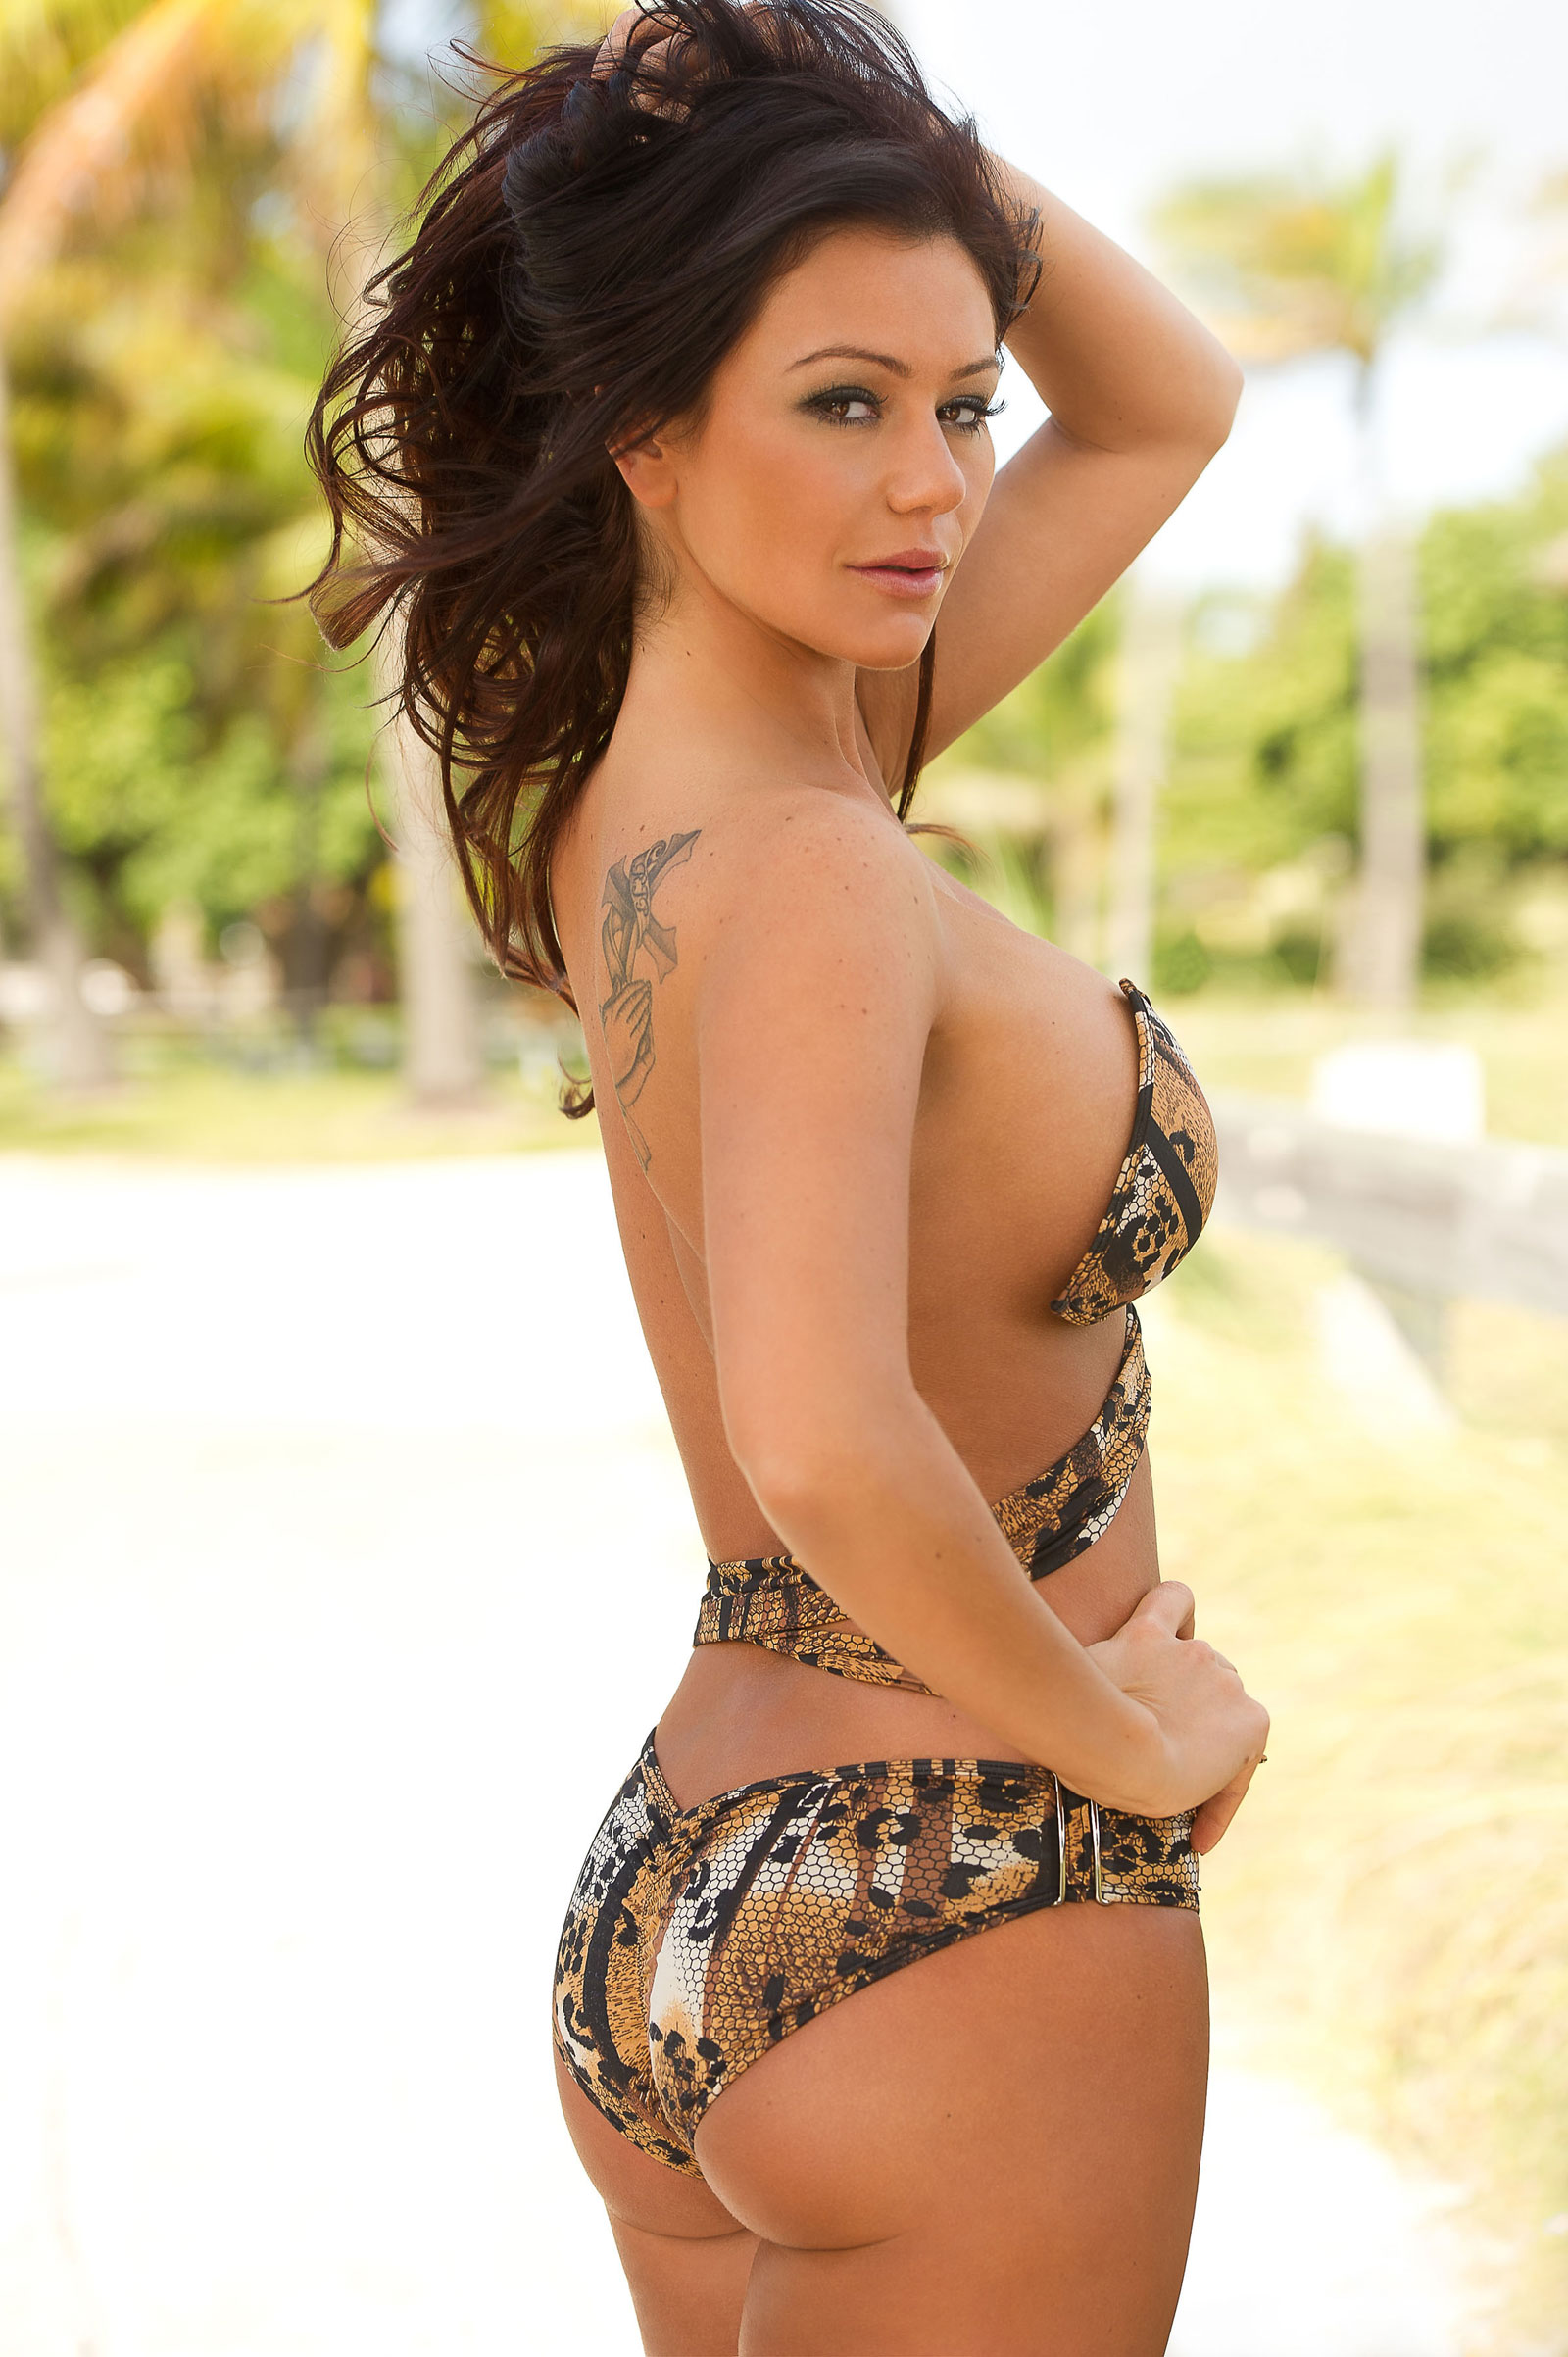 Jenni j wow desnuda